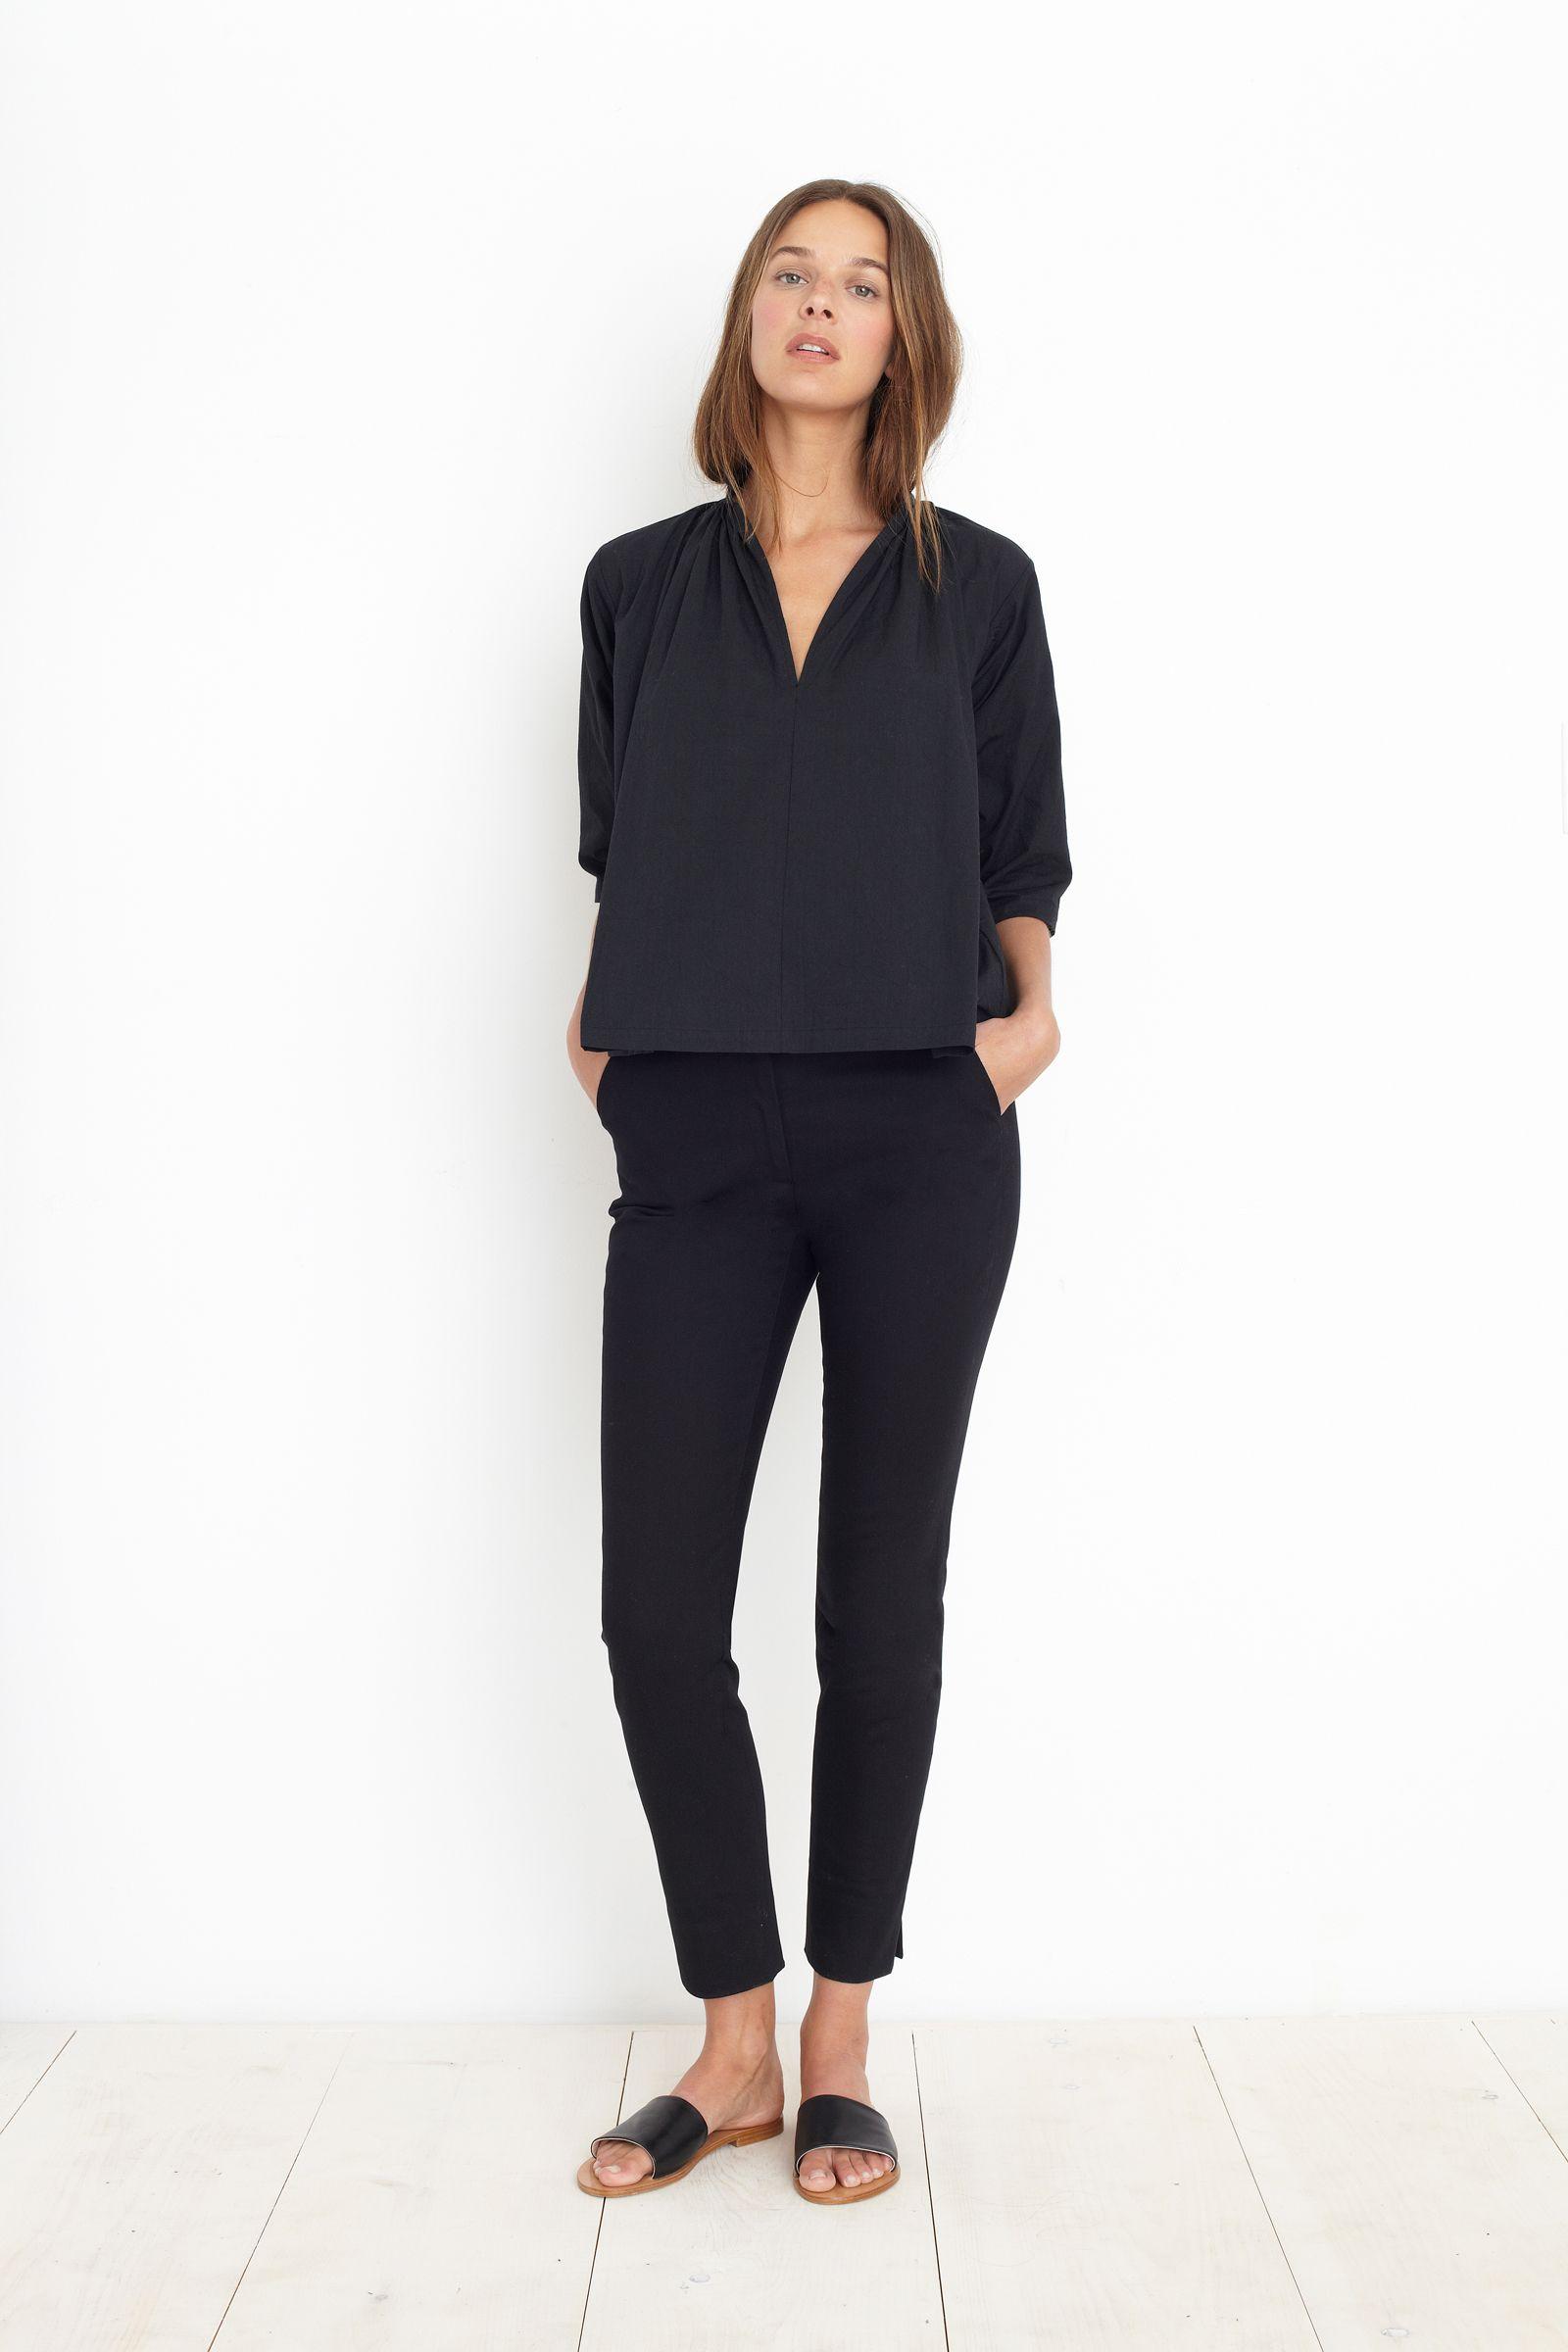 SHIRRED AGATA BLACK | Fashion, Fashion clothes women